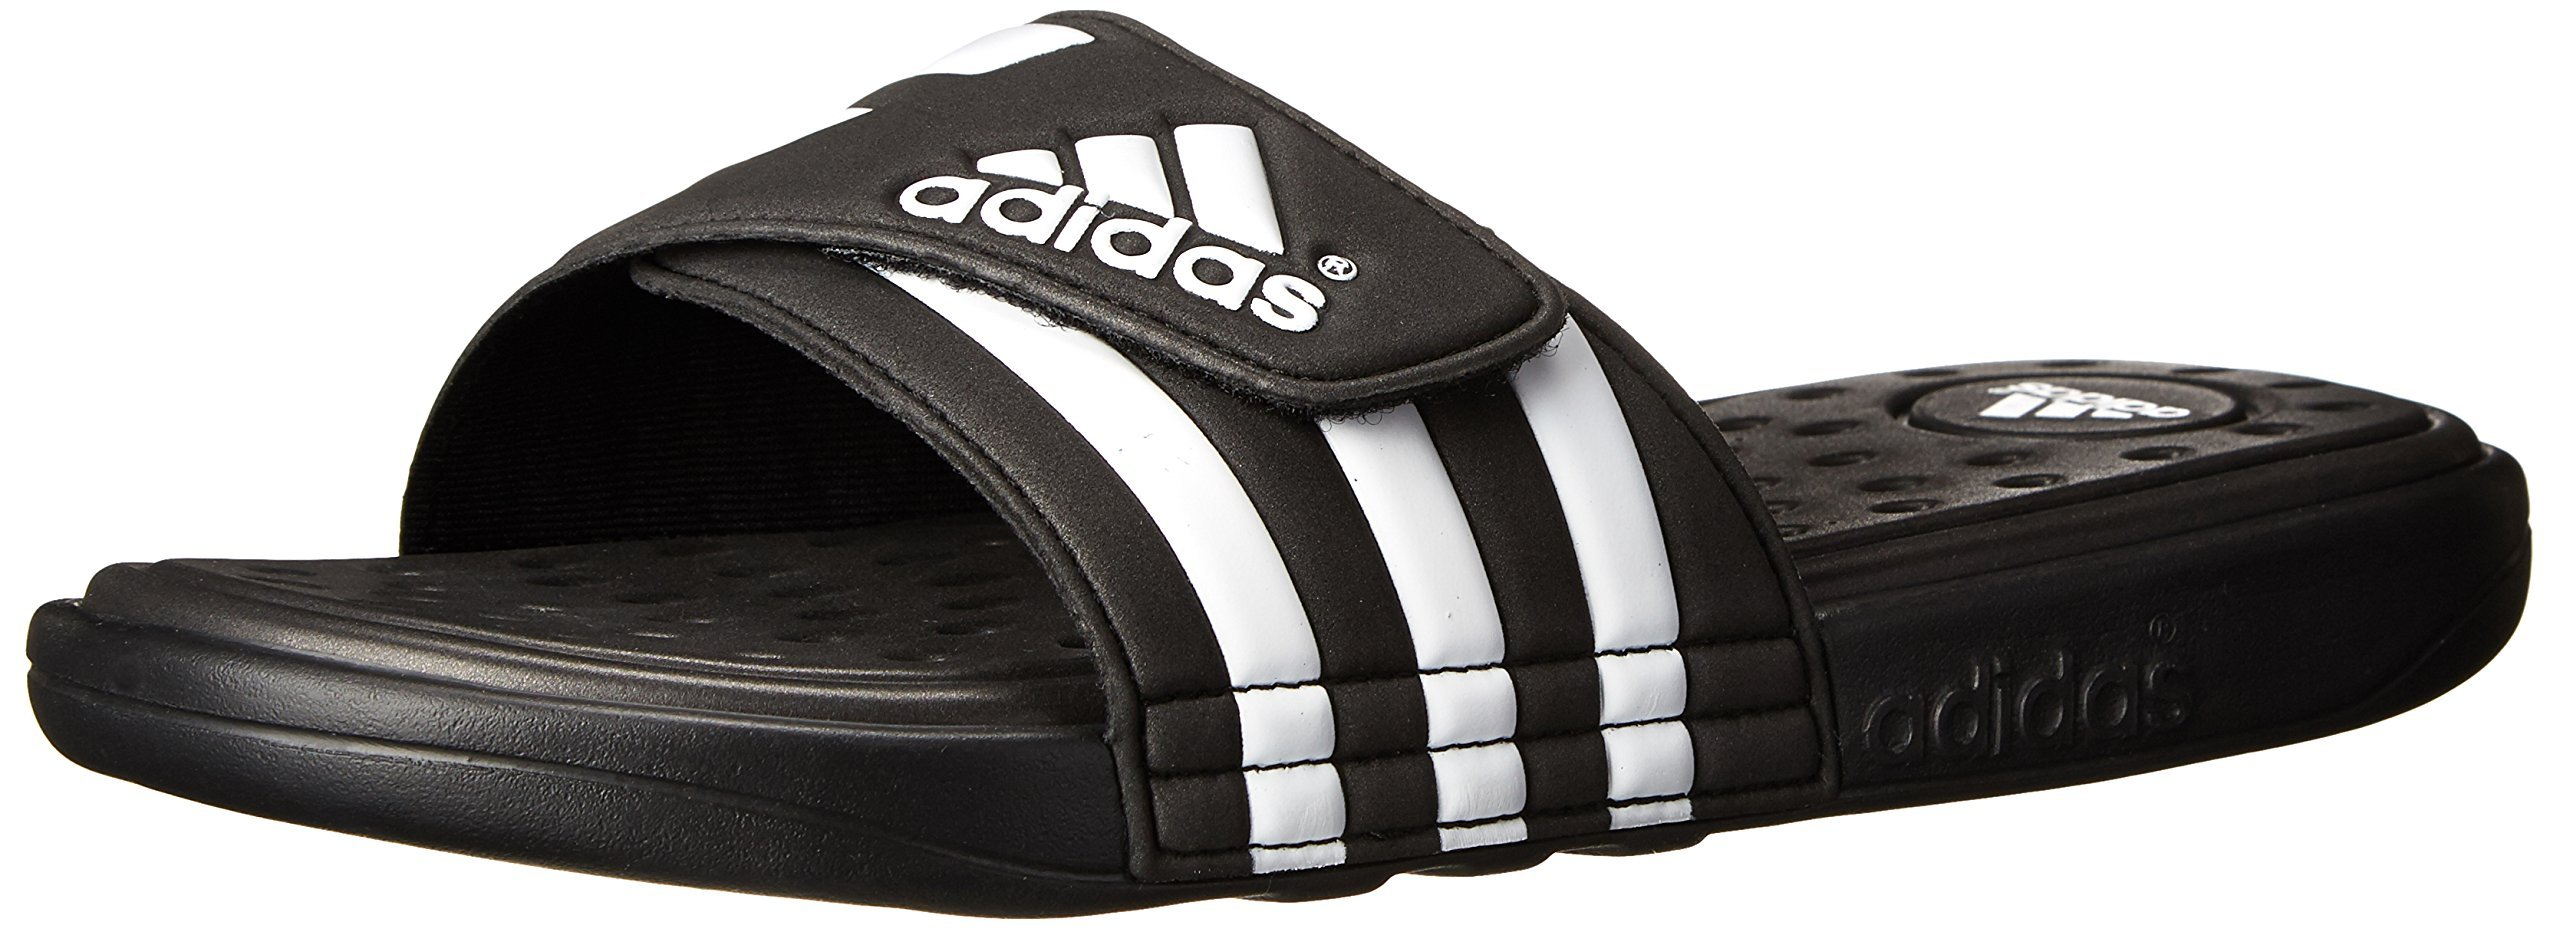 adidas Performance Men's adissage SC Sandal,Black/White/Black,11 M US